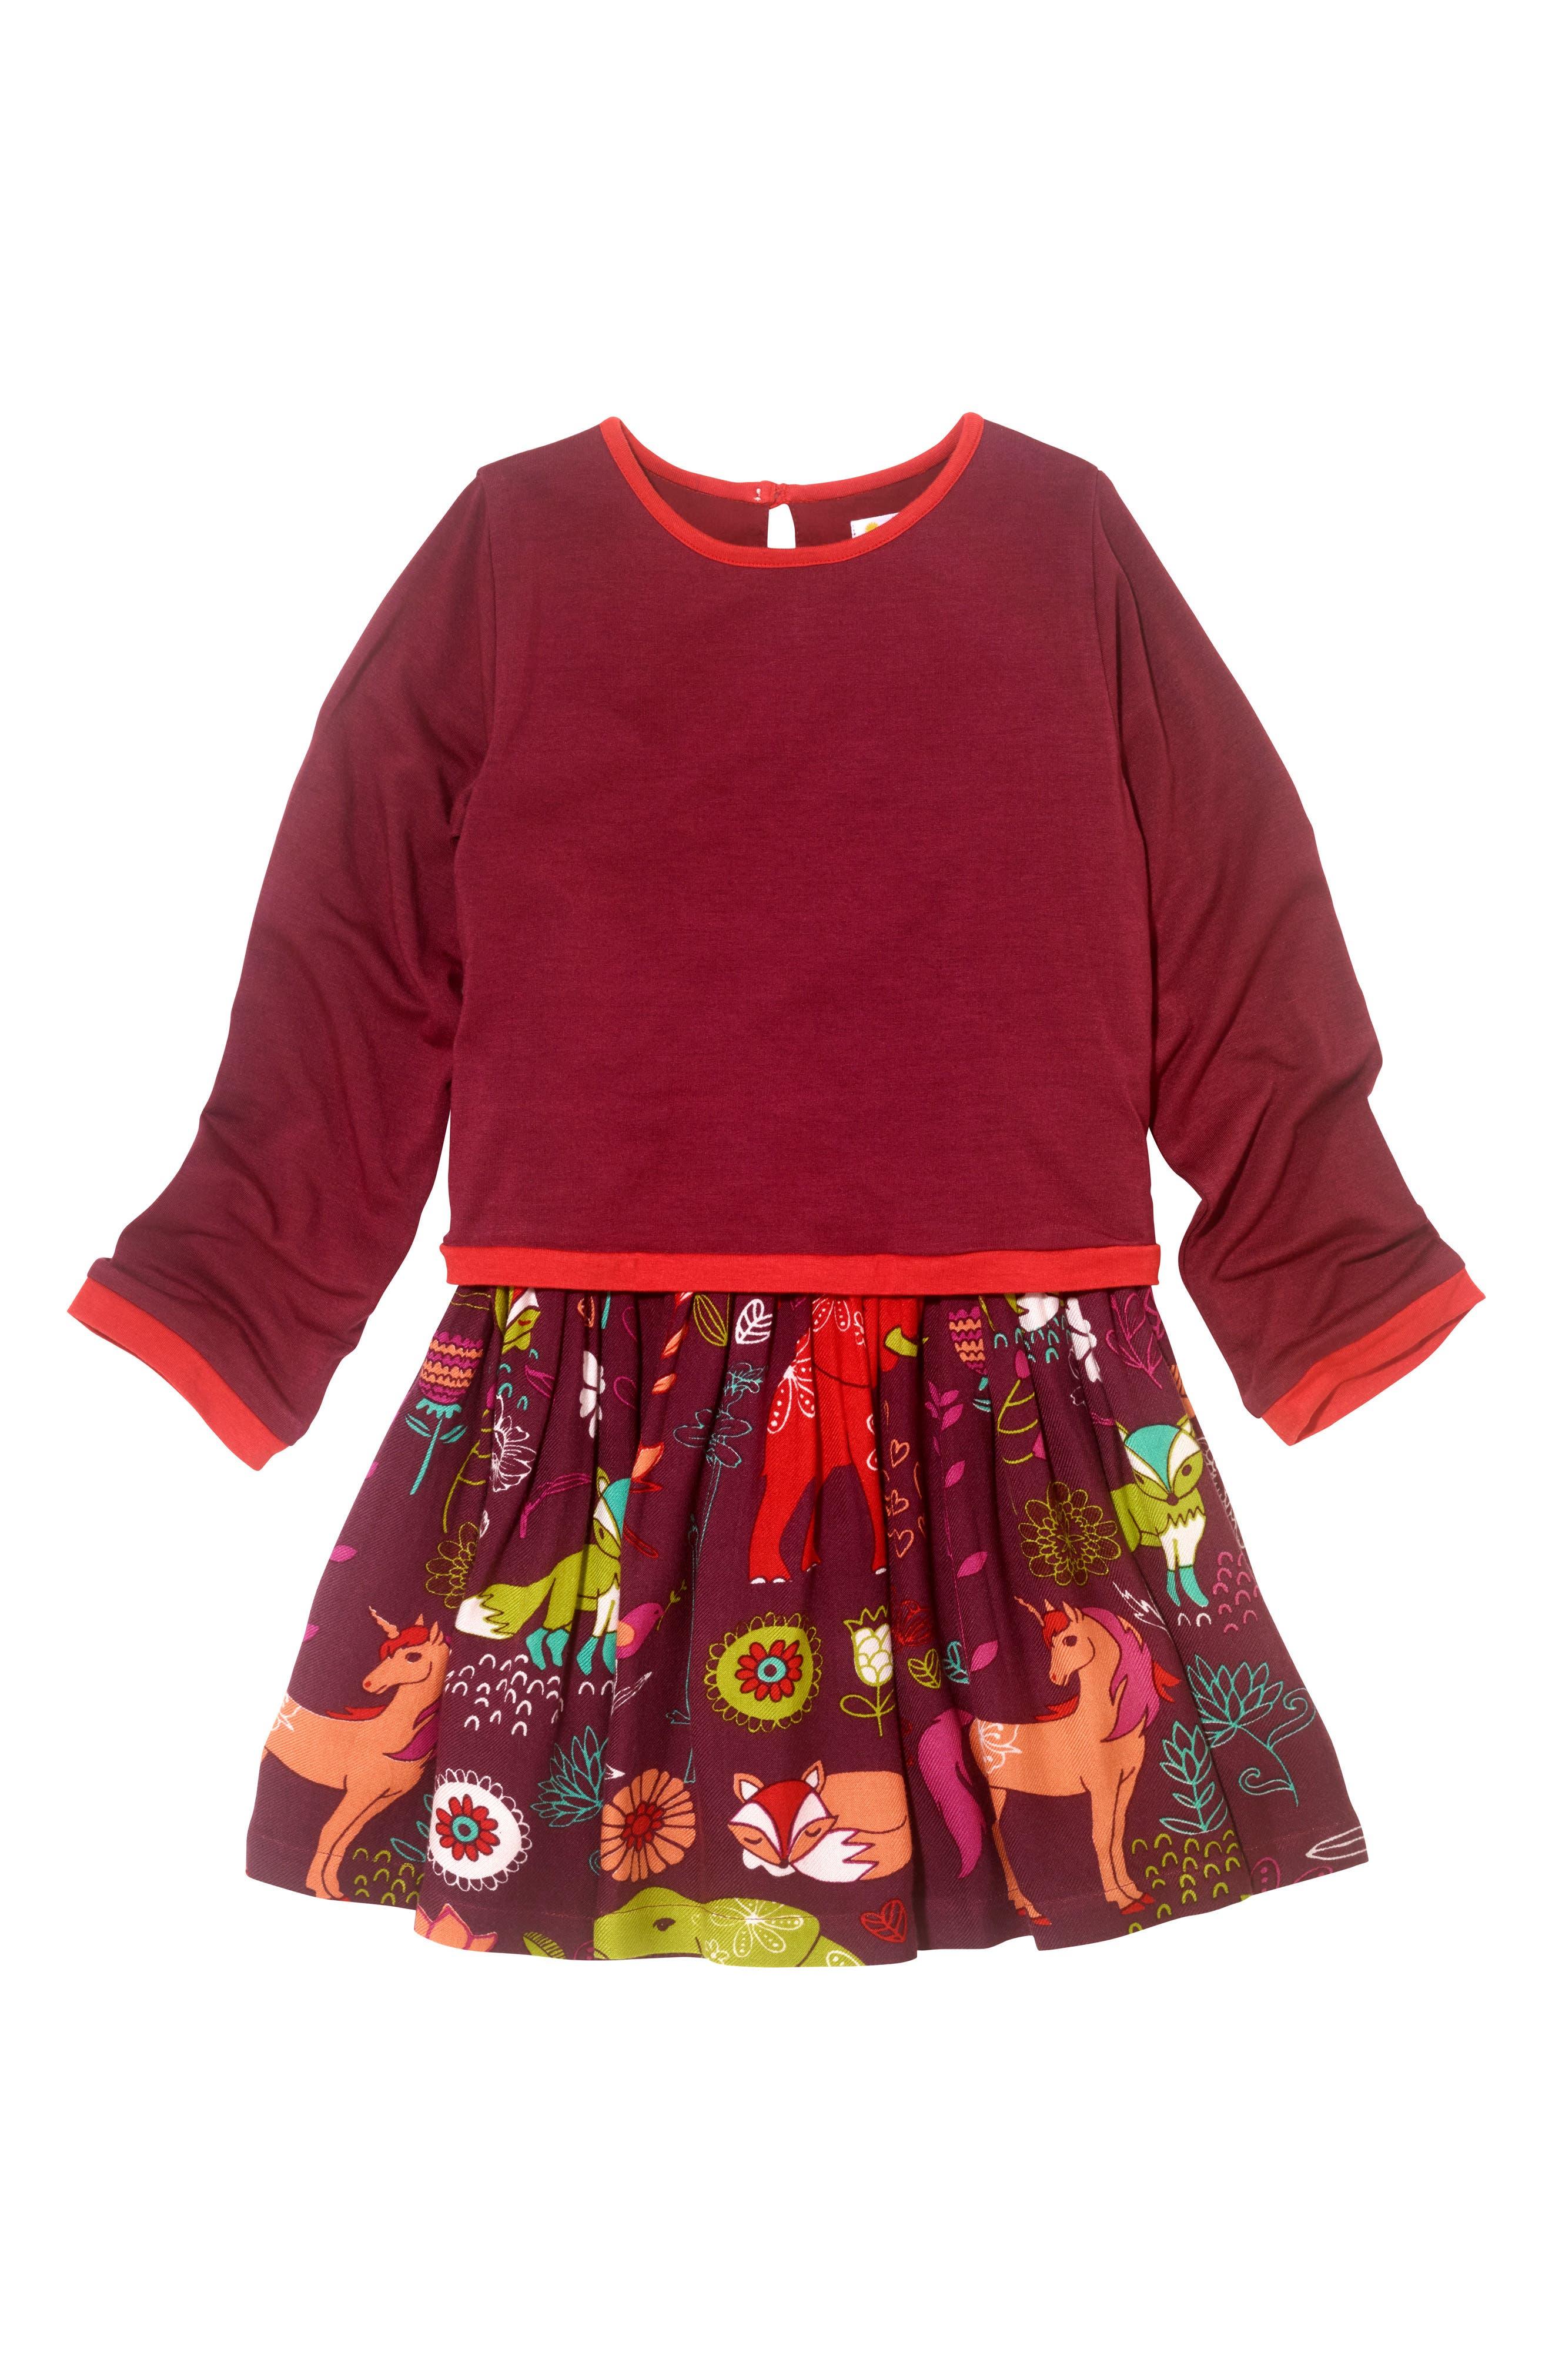 Forest Hills Dress,                             Main thumbnail 1, color,                             Burgundy